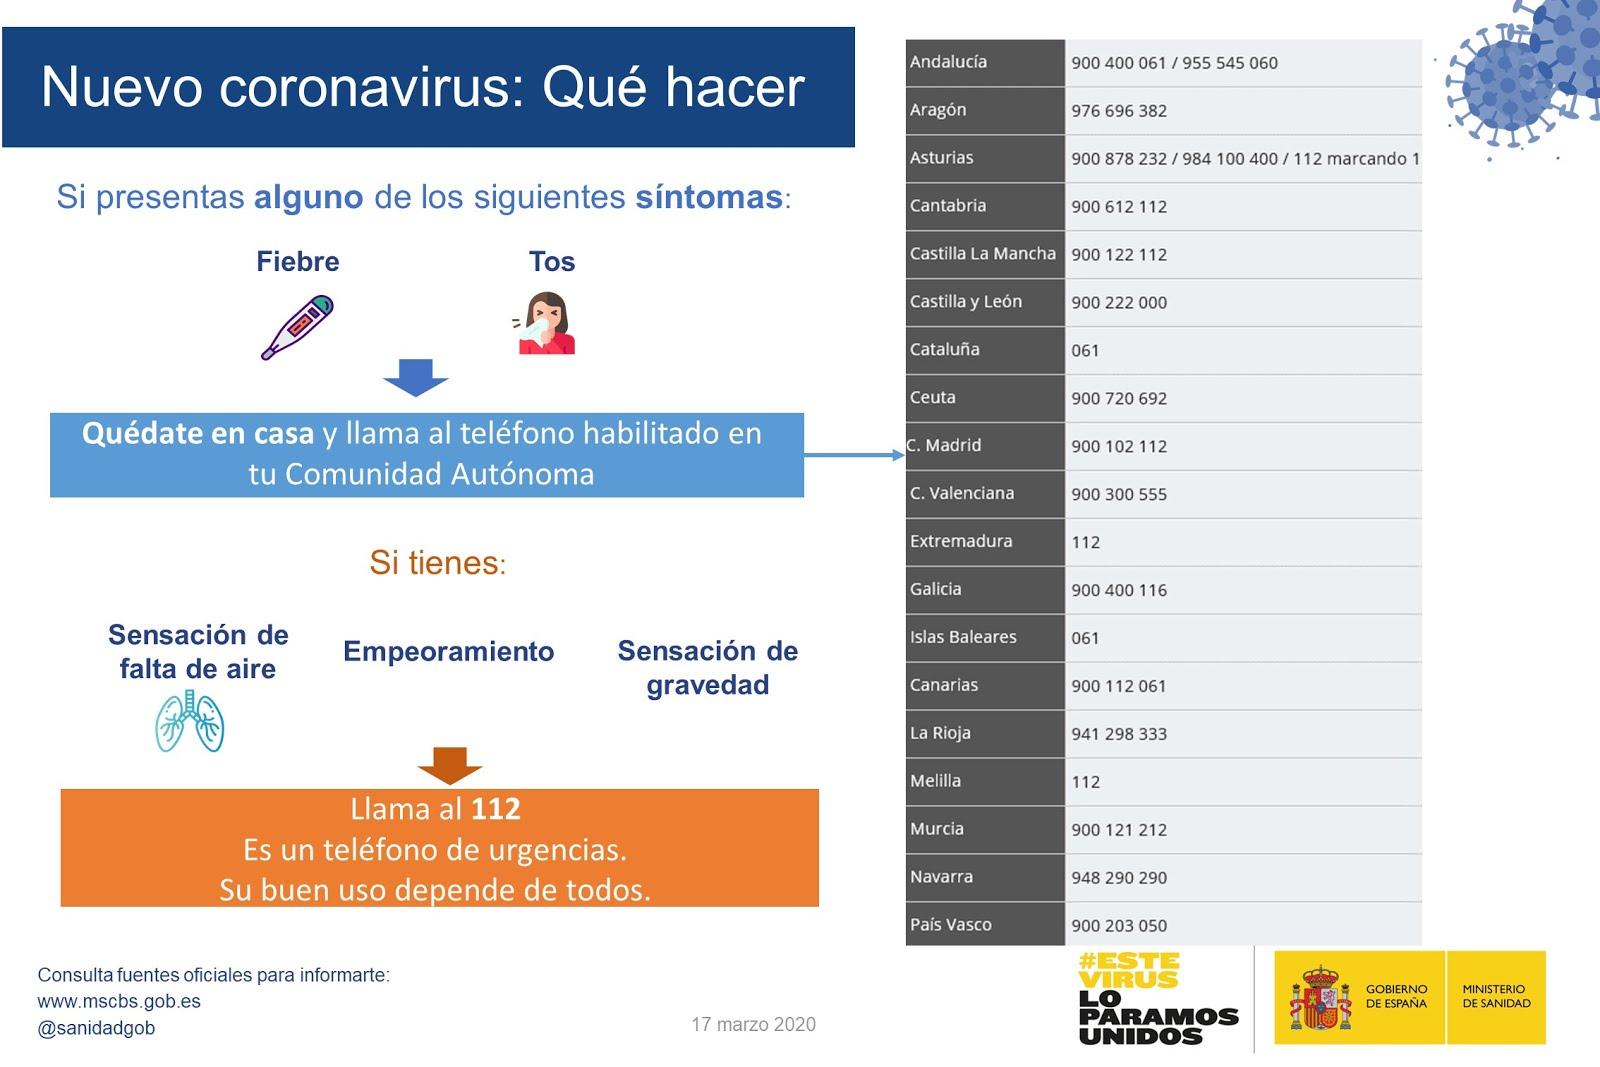 Anuncios Actualización Oficial COVID-19